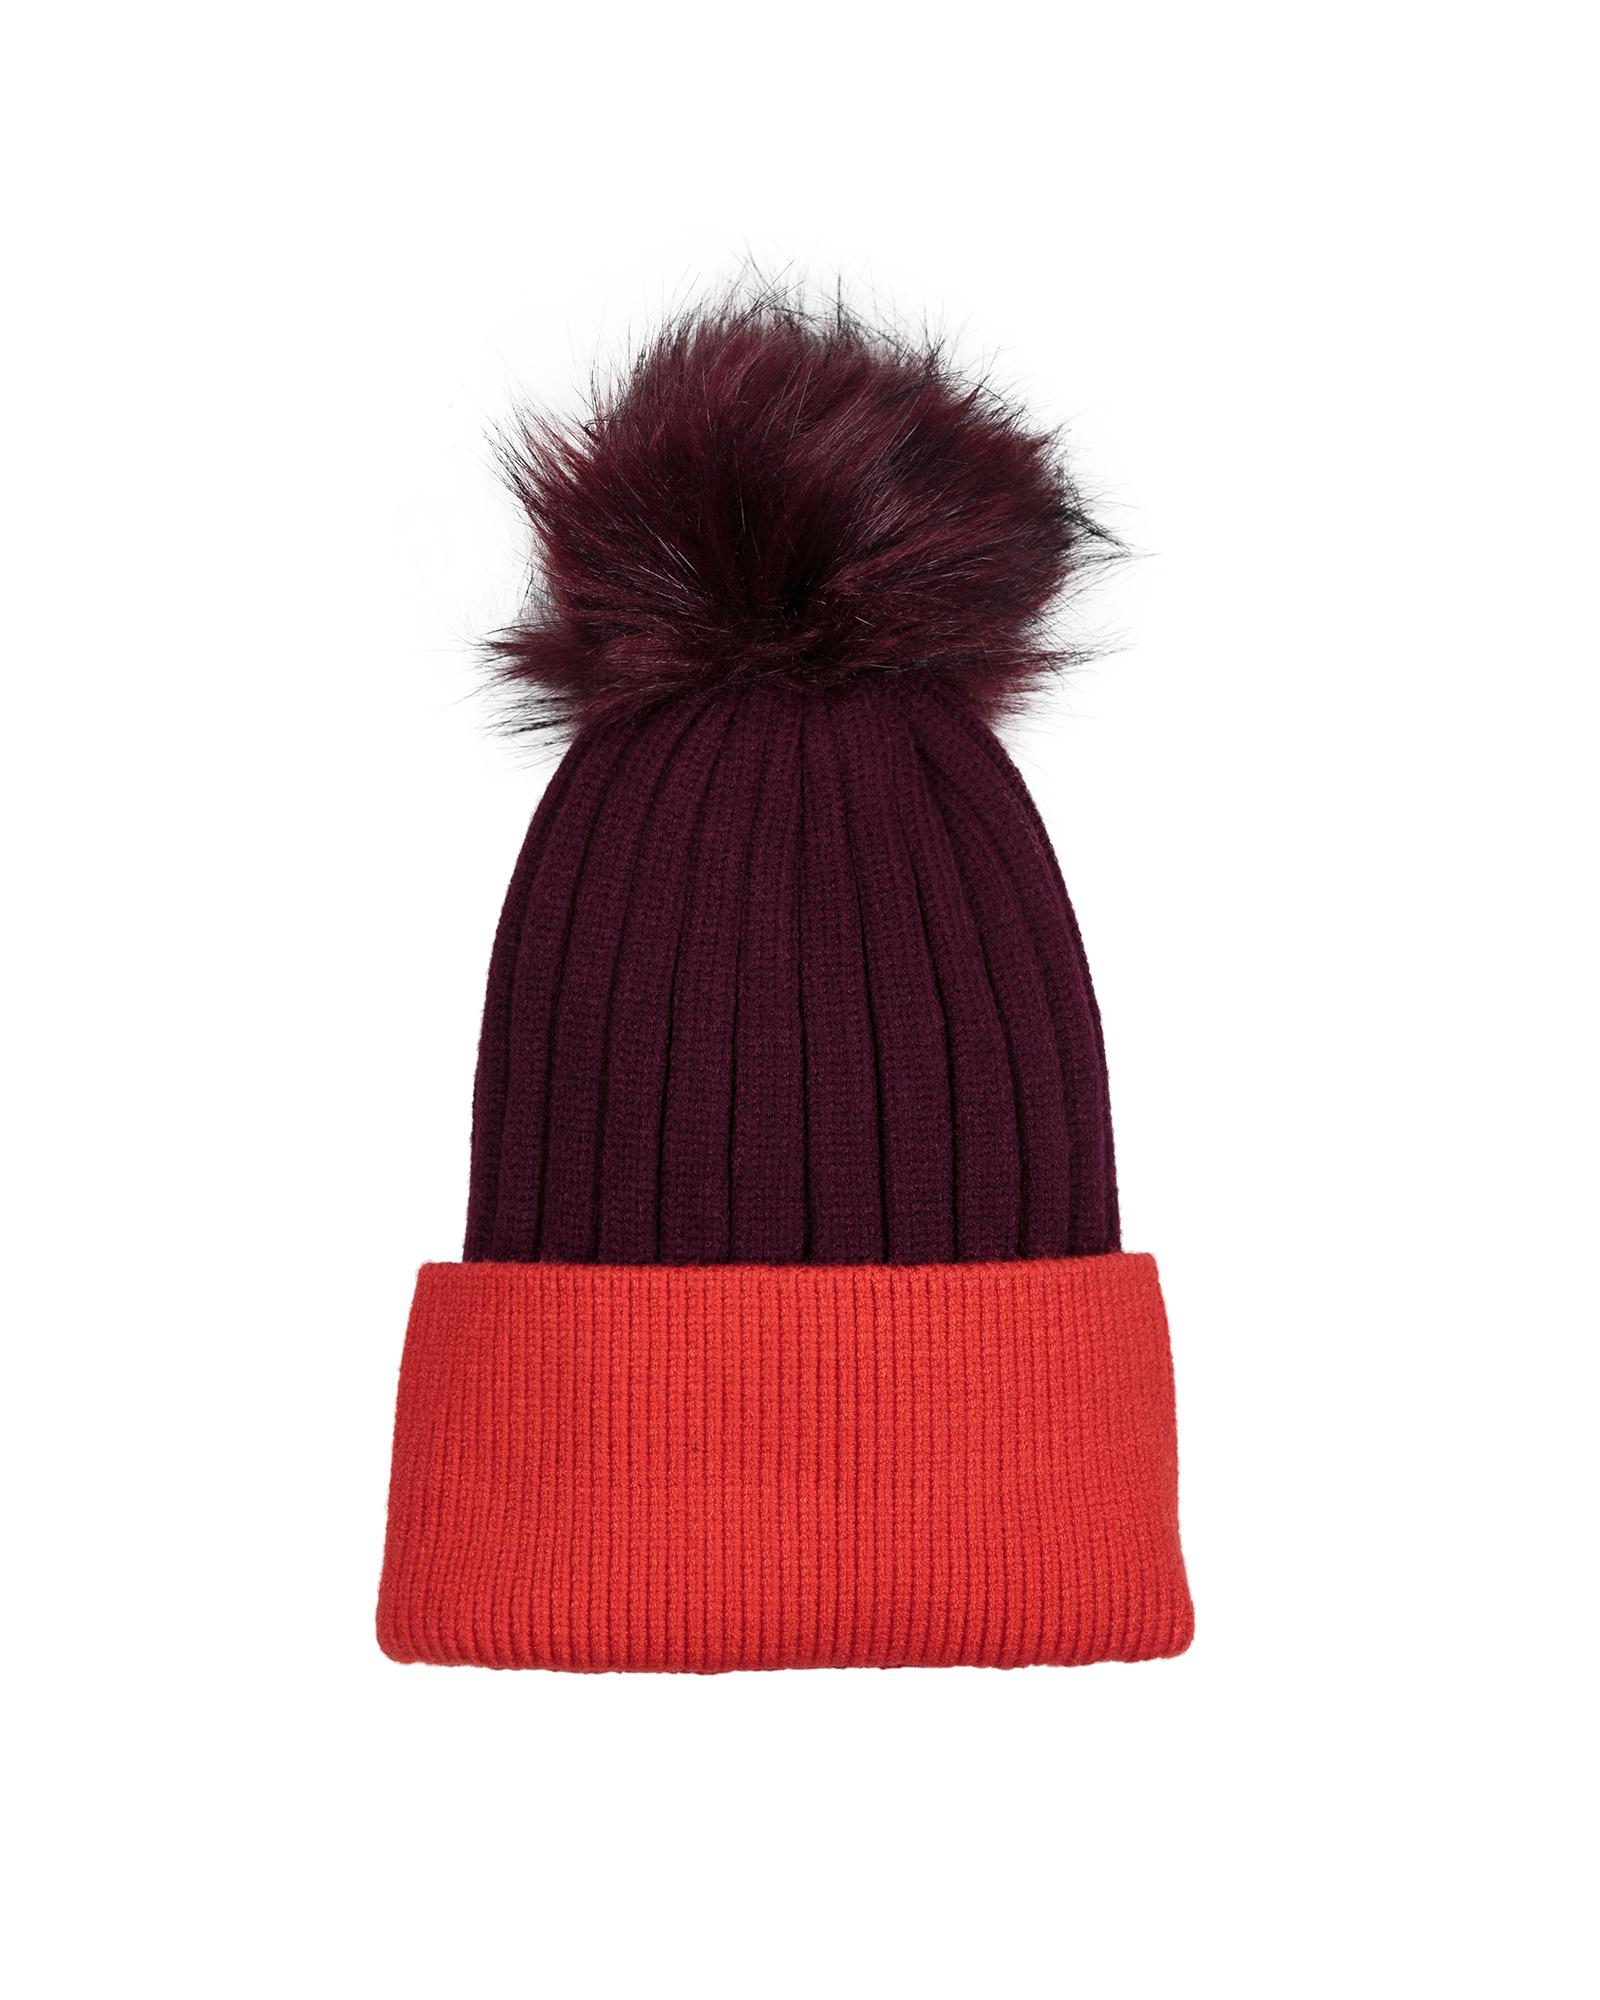 4efaf4db7 Color Block Red Beanie Hat